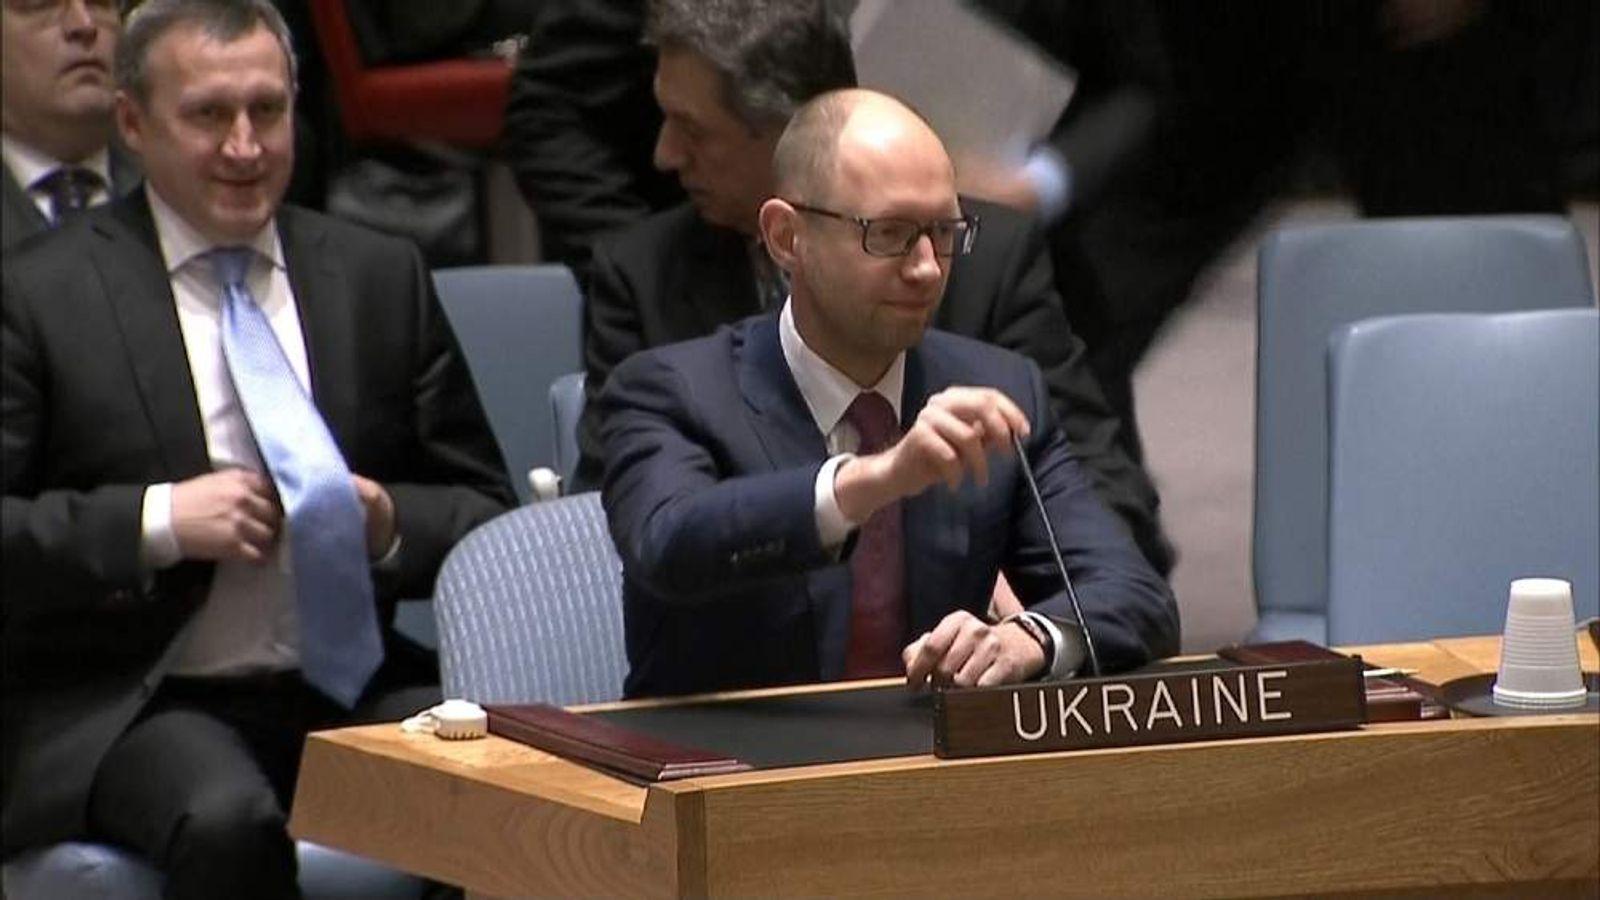 Interim Ukrainian President Arseniy Yatsenyuk